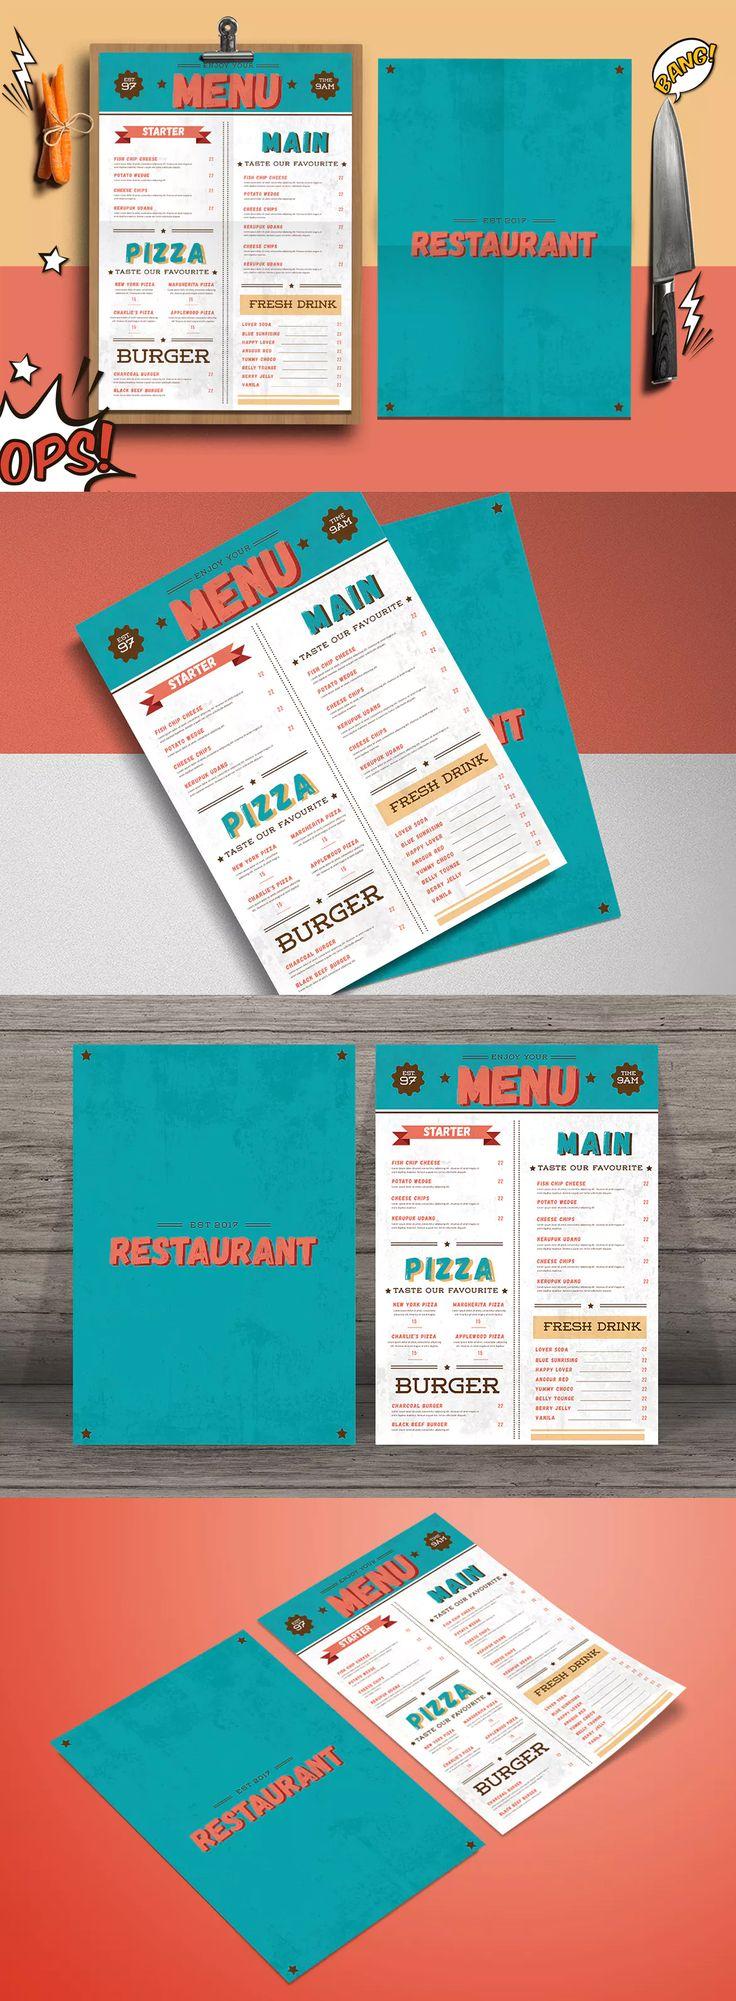 Mejores 77 imágenes de Food Menu Templates en Pinterest | Plantilla ...